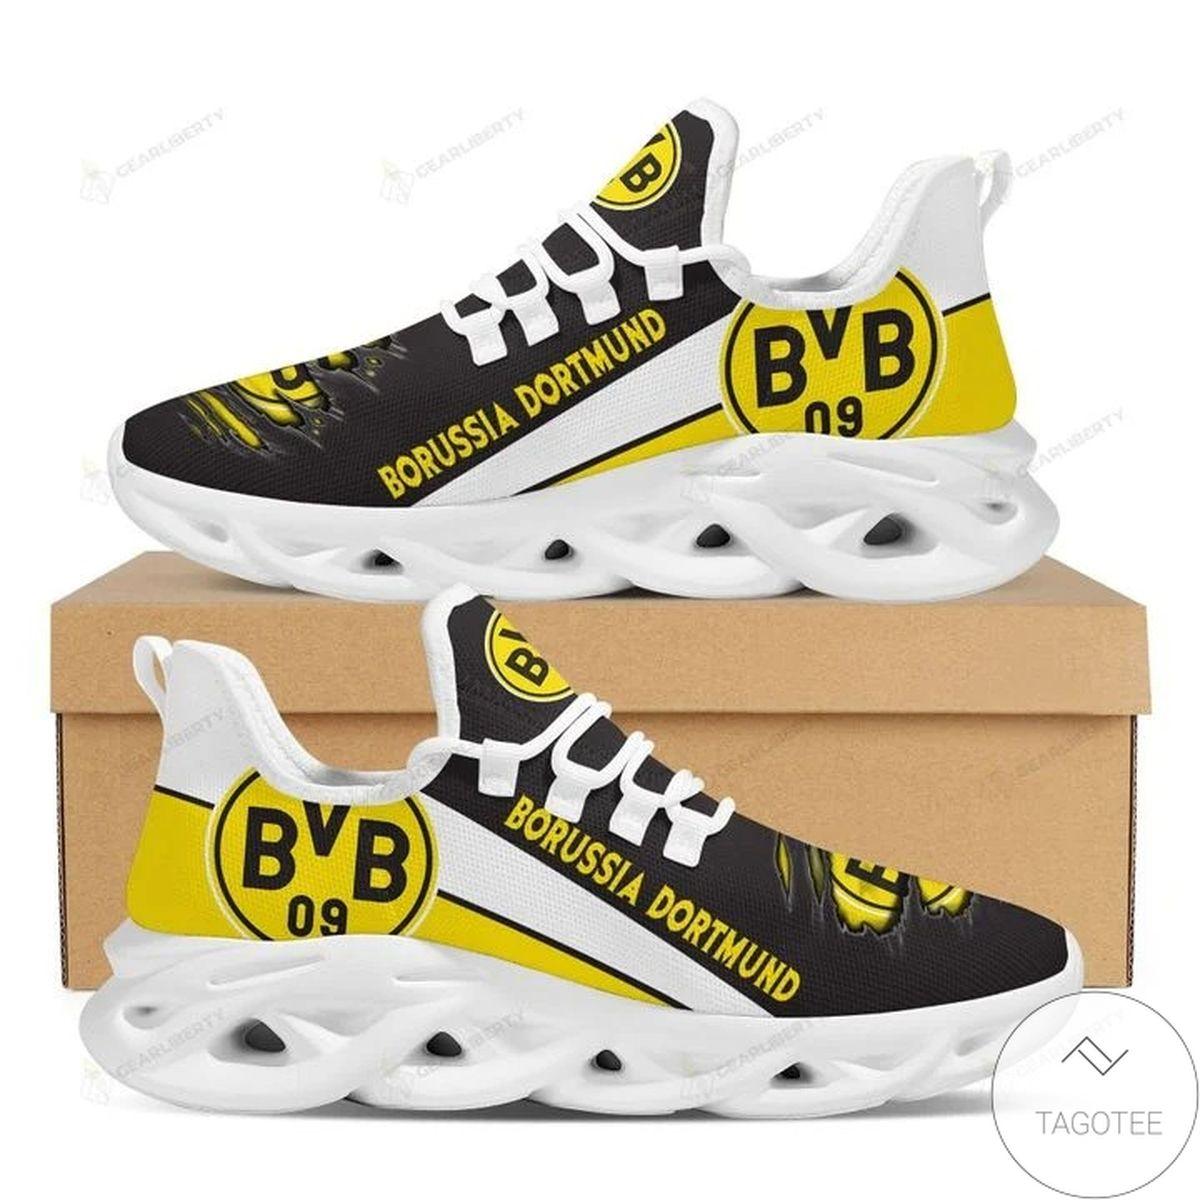 Bundesliga Borussia Dortmund Bvb 09 Max Soul Shoes